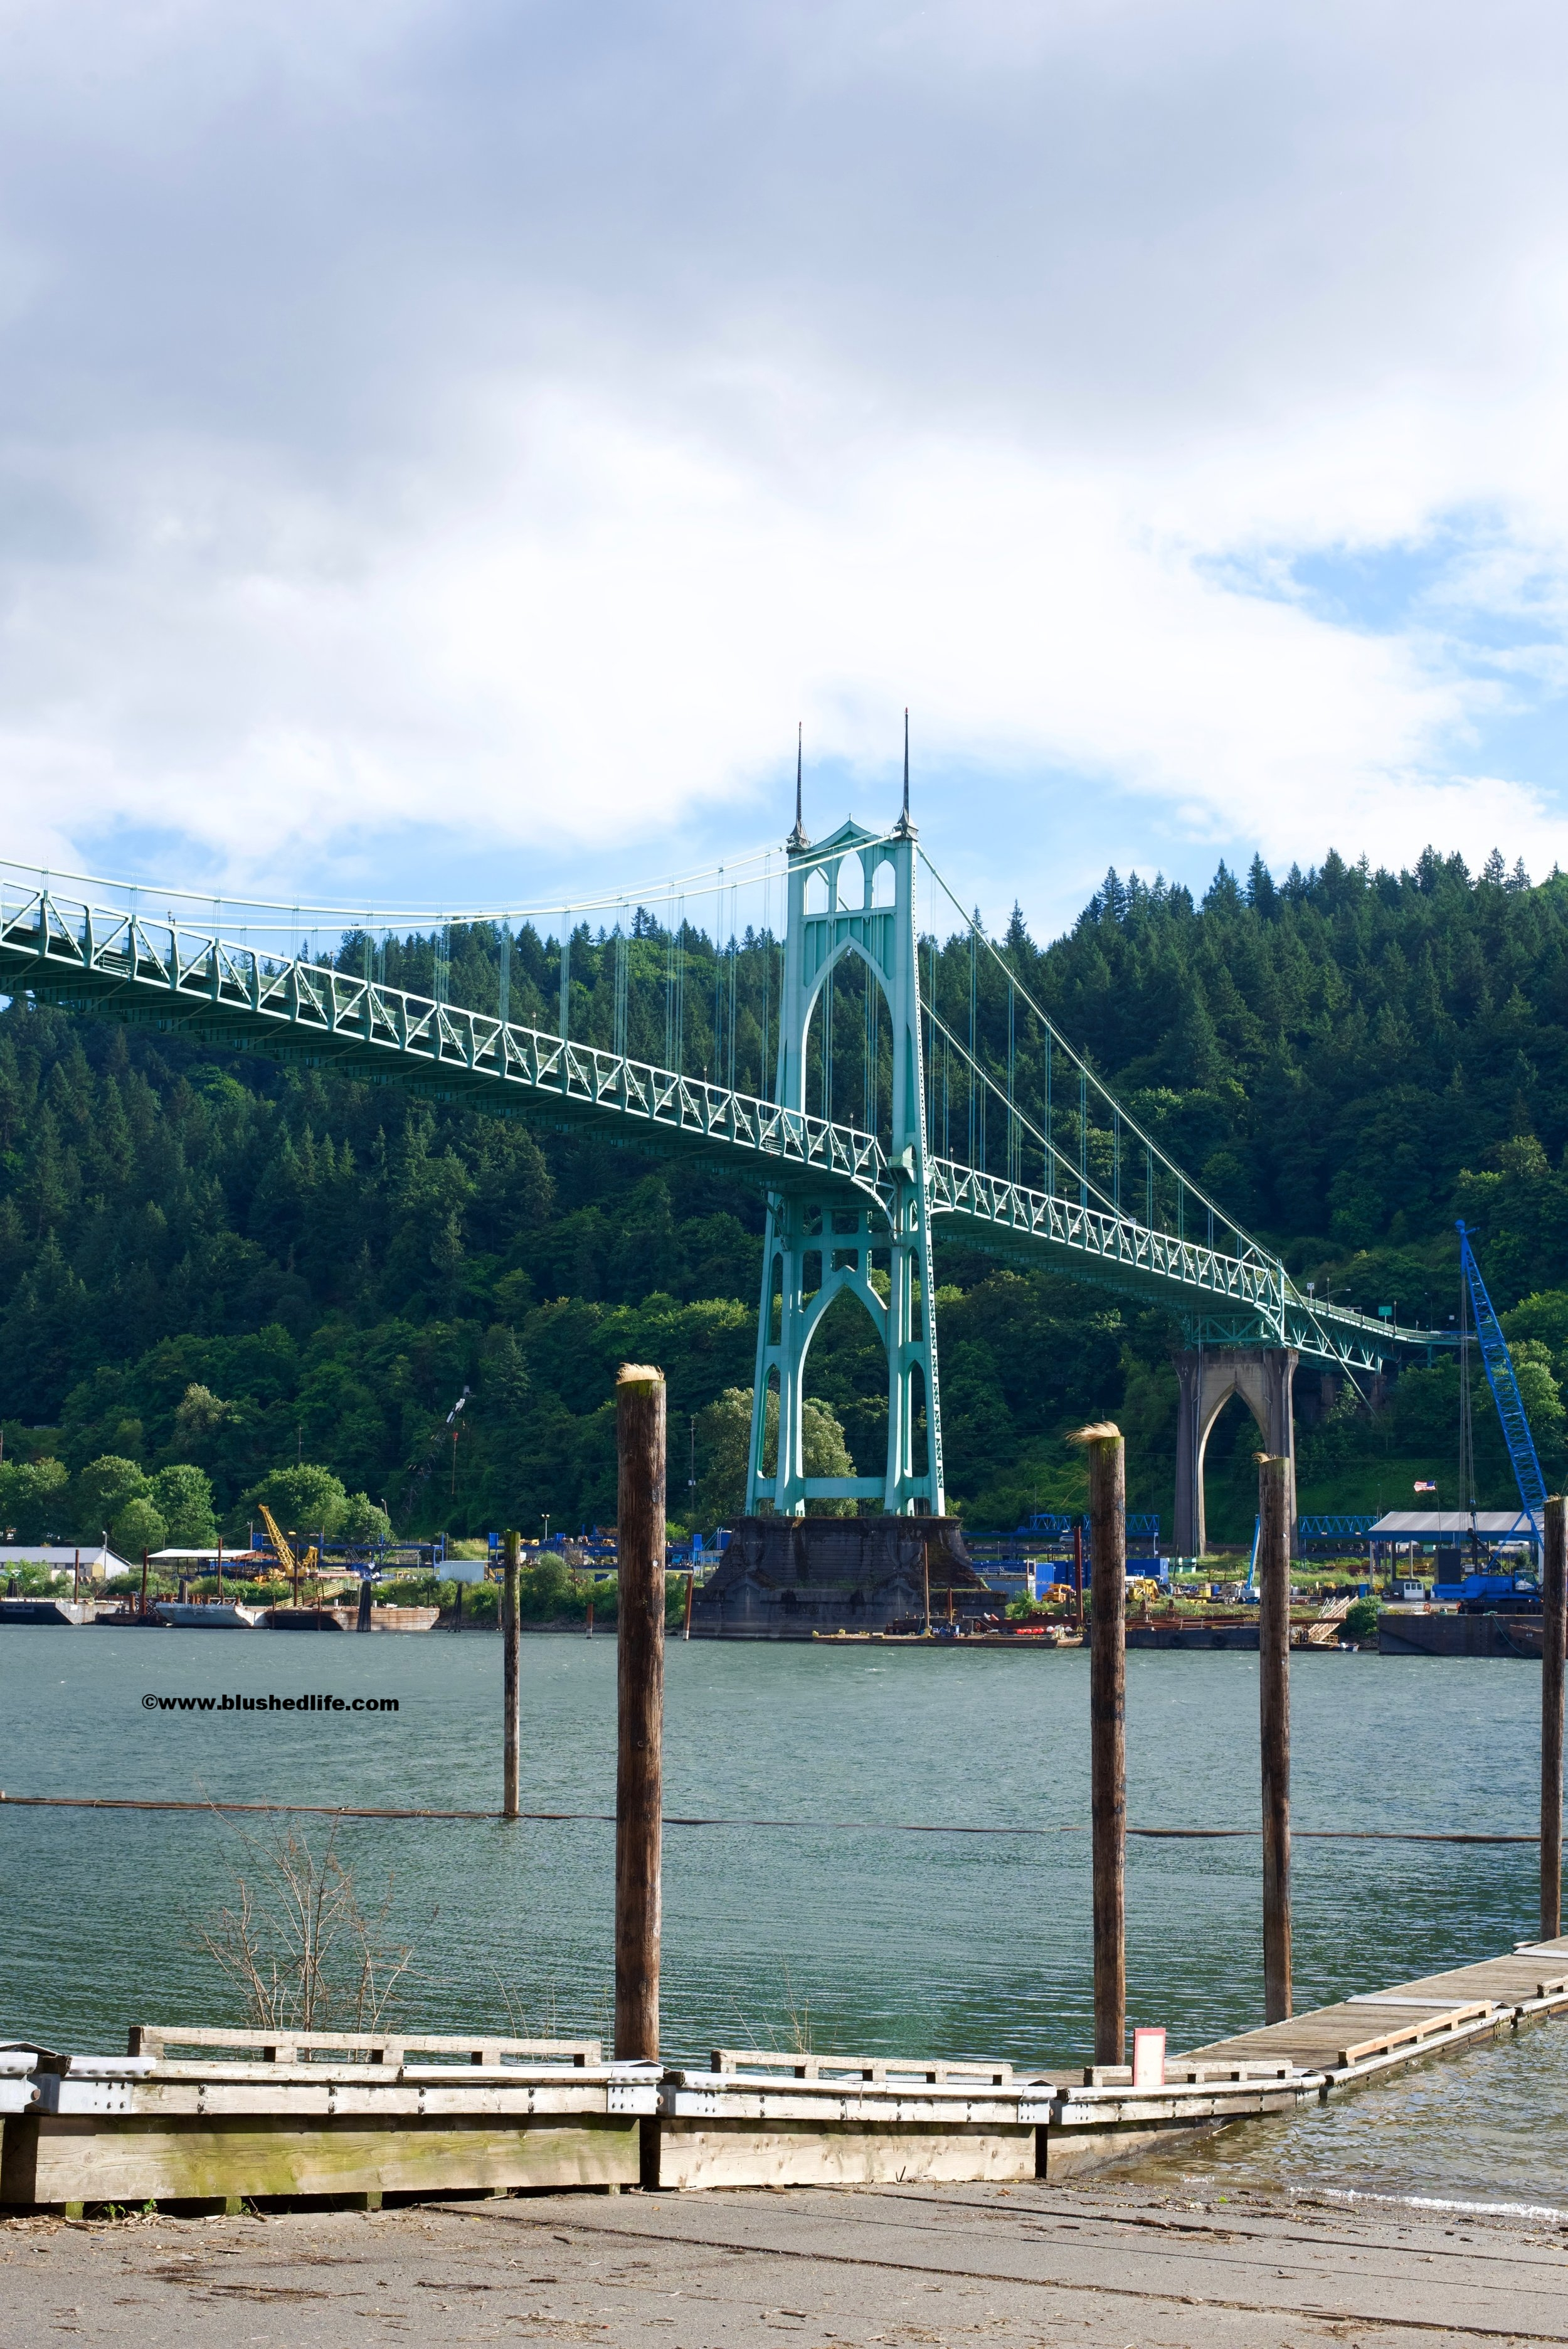 Adios Portland! Hope to visit you again soon :)